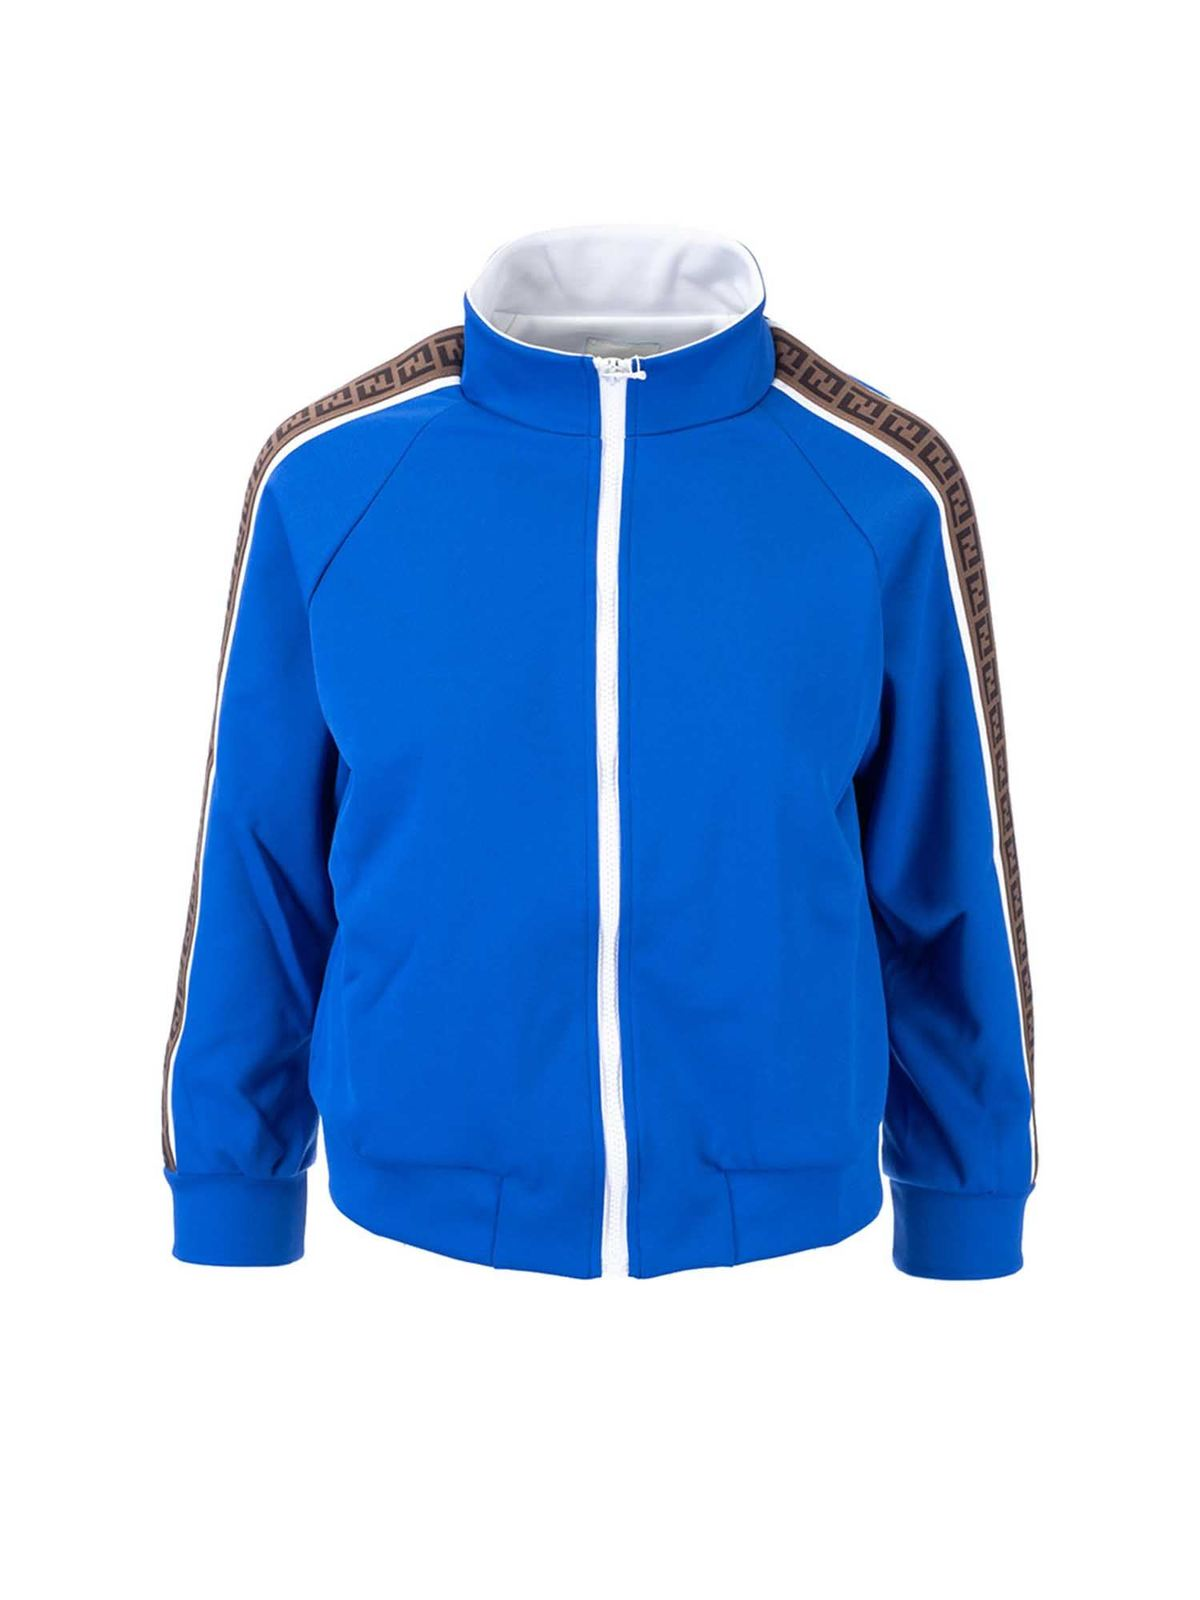 Fendi Jr Cottons FF BANDS SWEATSHIRT IN ELECTRIC BLUE